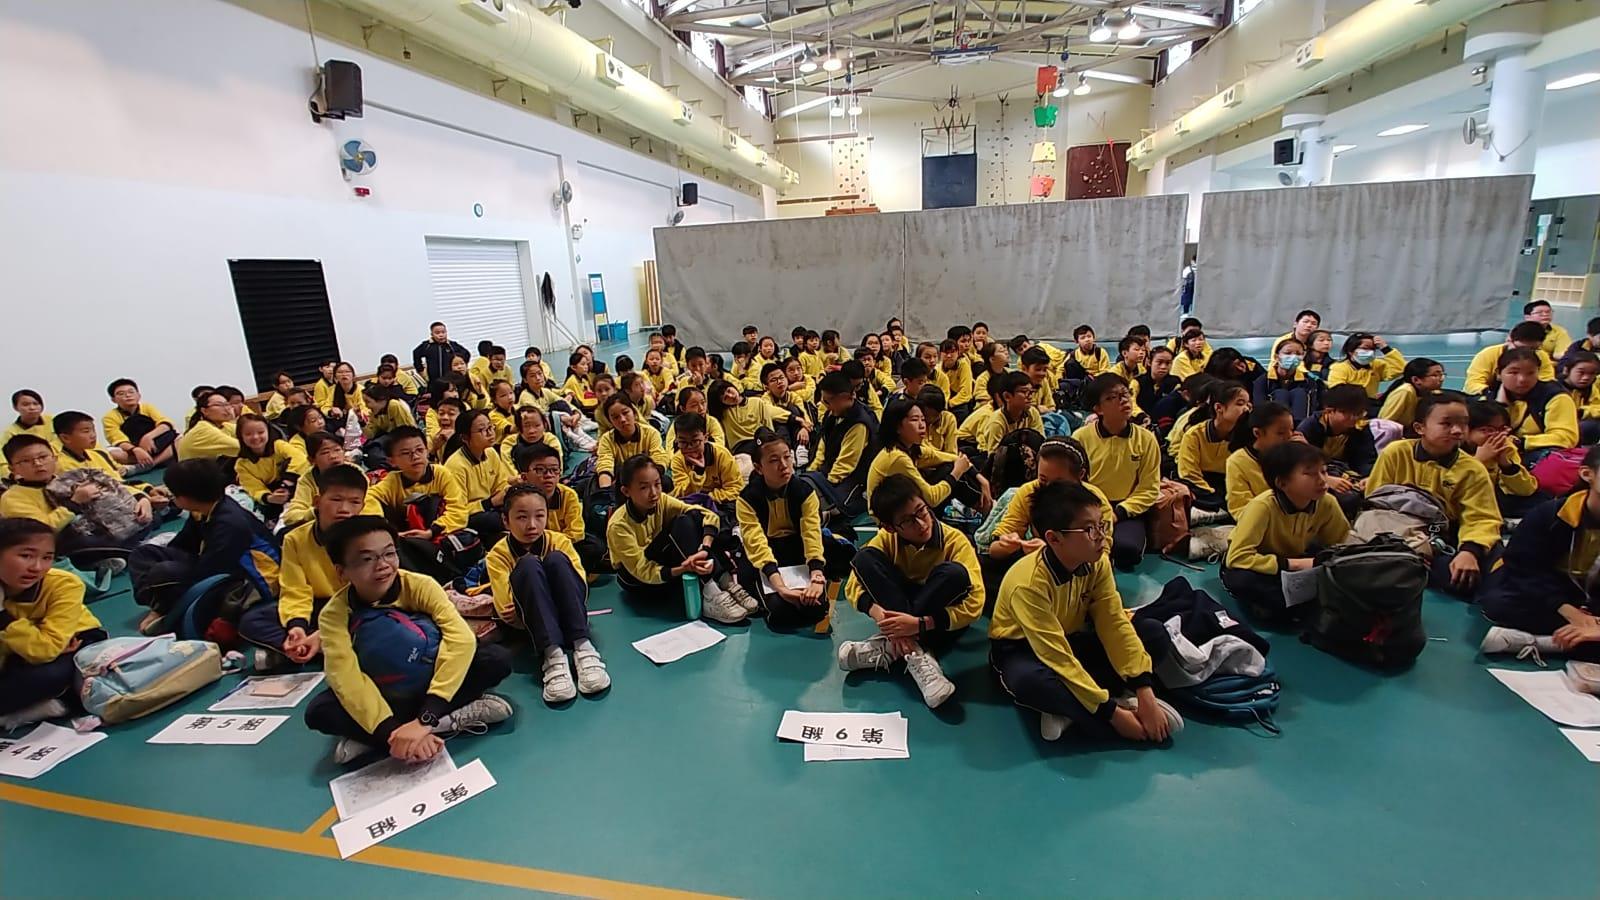 https://plkcjy.edu.hk/sites/default/files/whatsapp_image_2019-12-21_at_14.04.21_2.jpeg